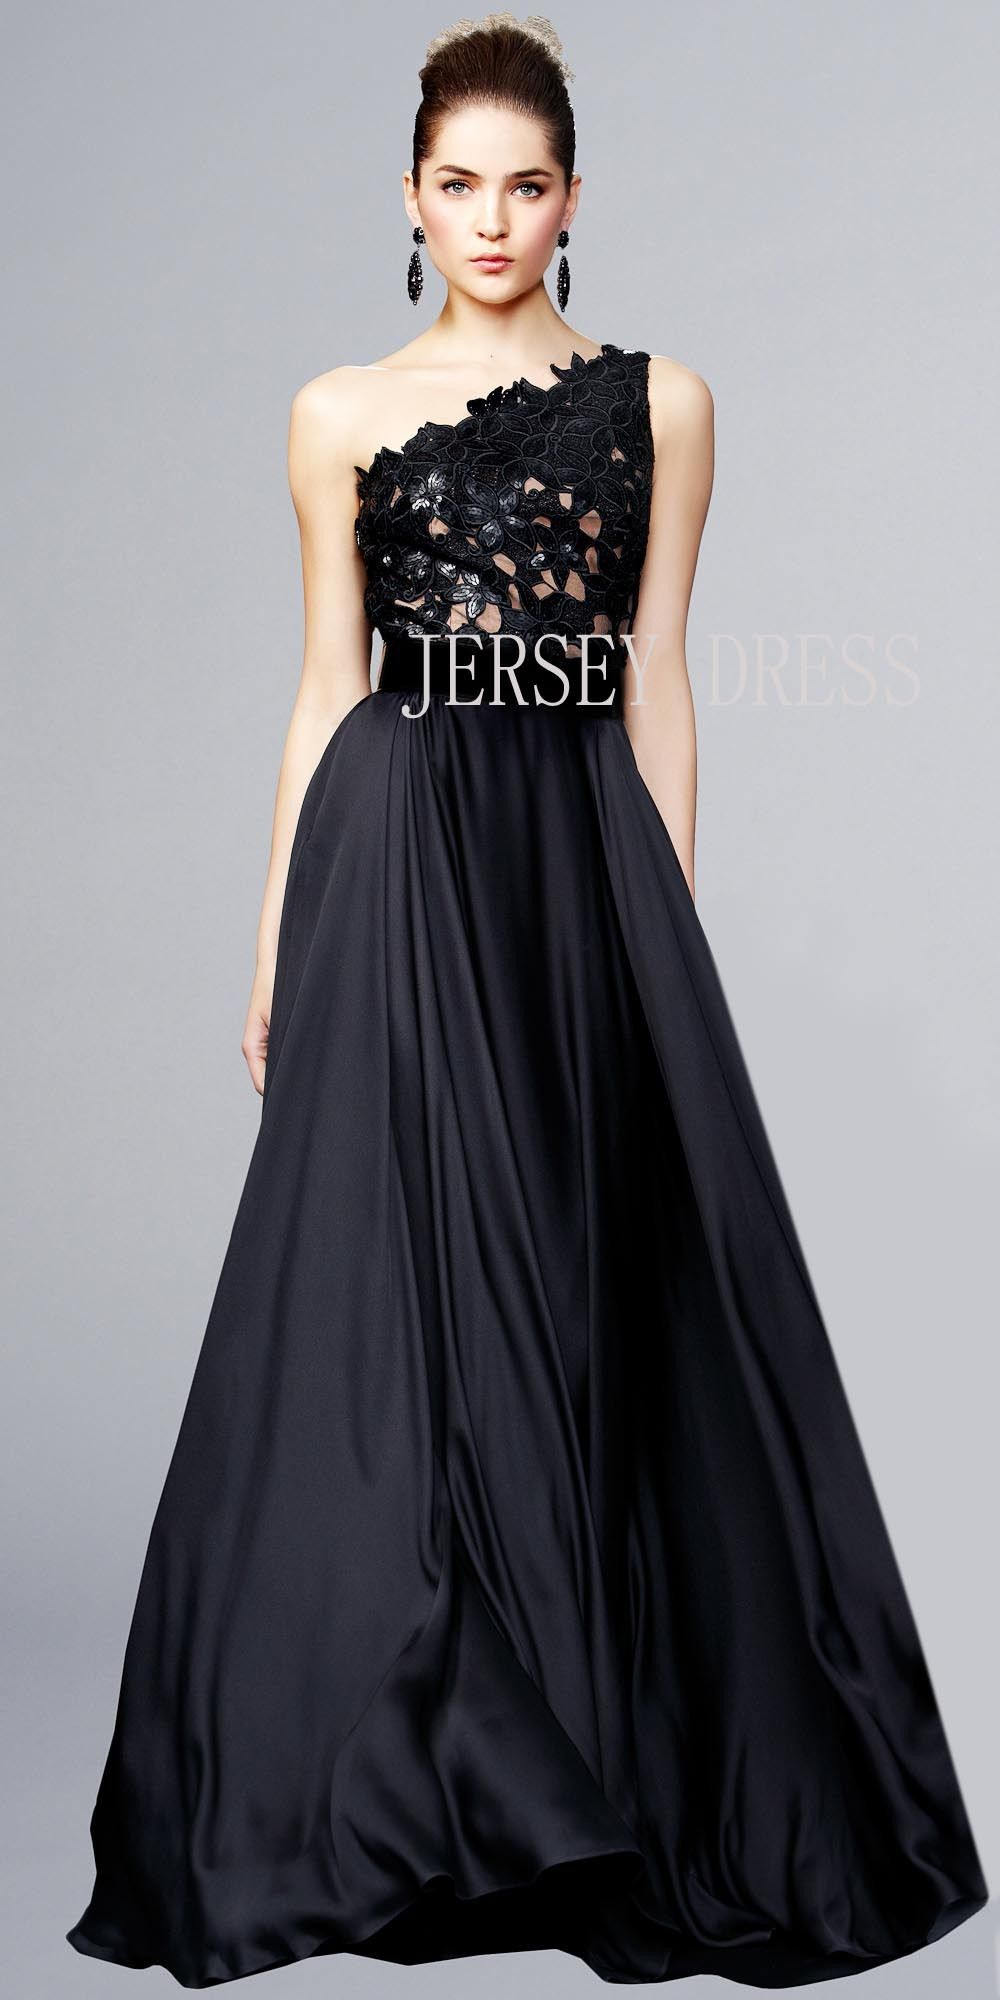 Star of the same models black evening dress skirt E2442 oblique ...